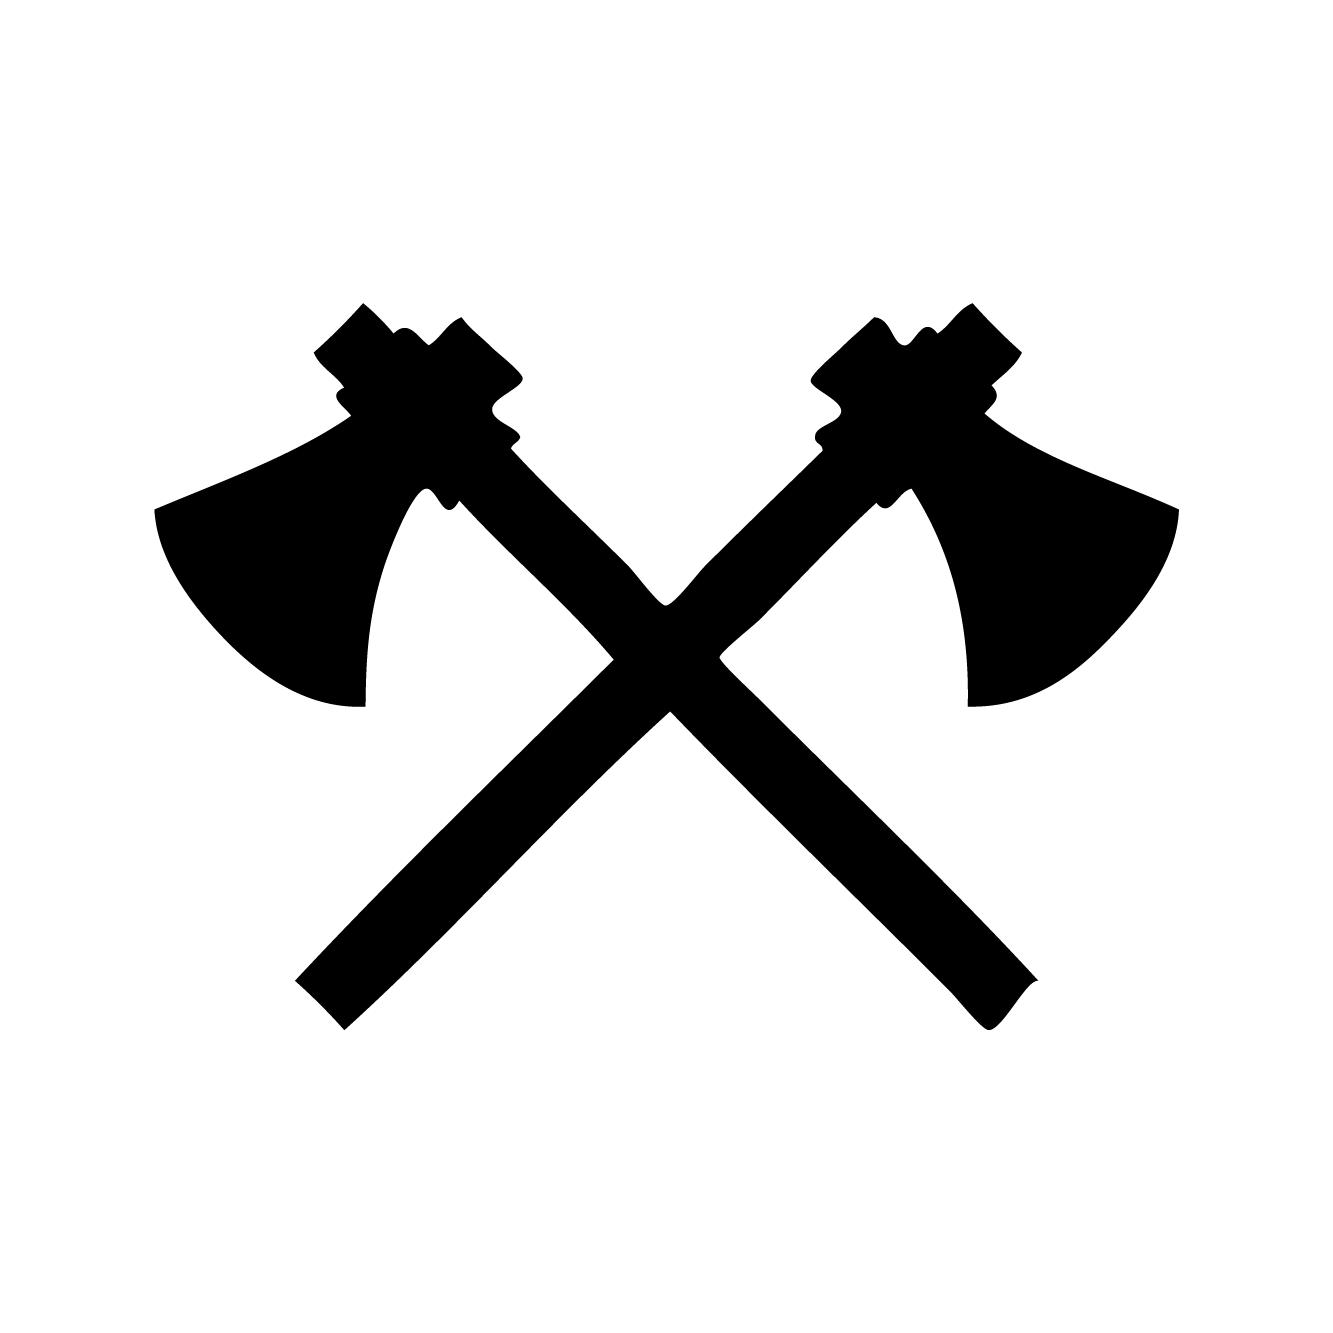 Axe Tattoo | Habitatt Supply Co | Finest Quality Designed Temporary Tattoos - Axe Black Logo PNG